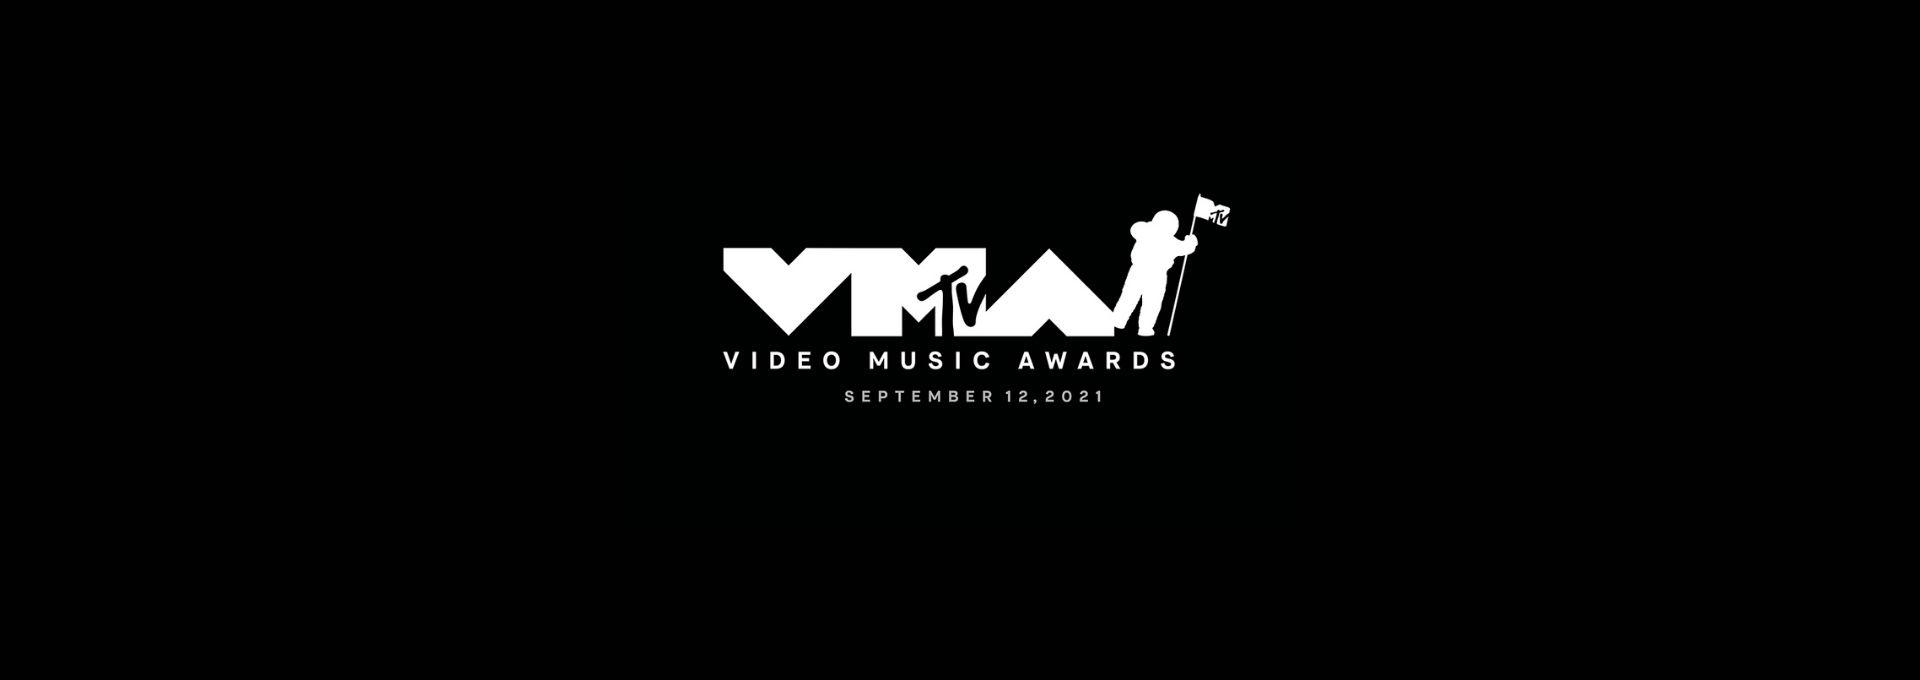 2021 MVT 音樂大獎 (VMA) 入圍歌單